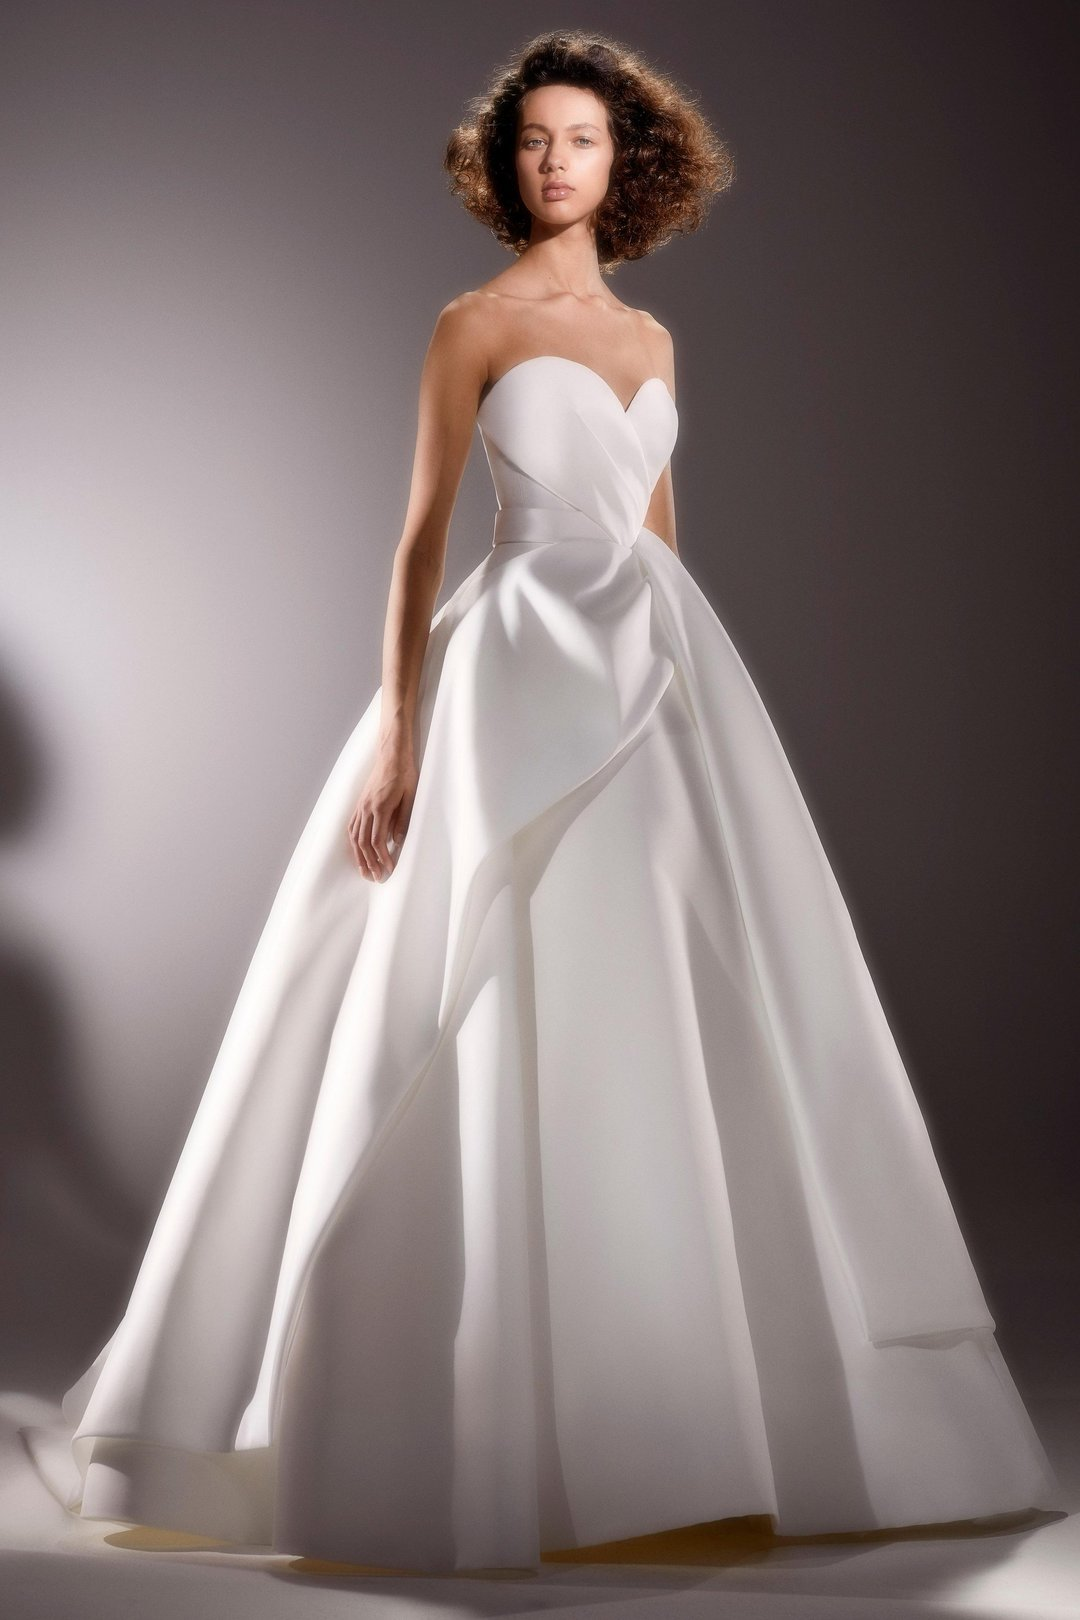 sculptural sash drape gown  dress photo